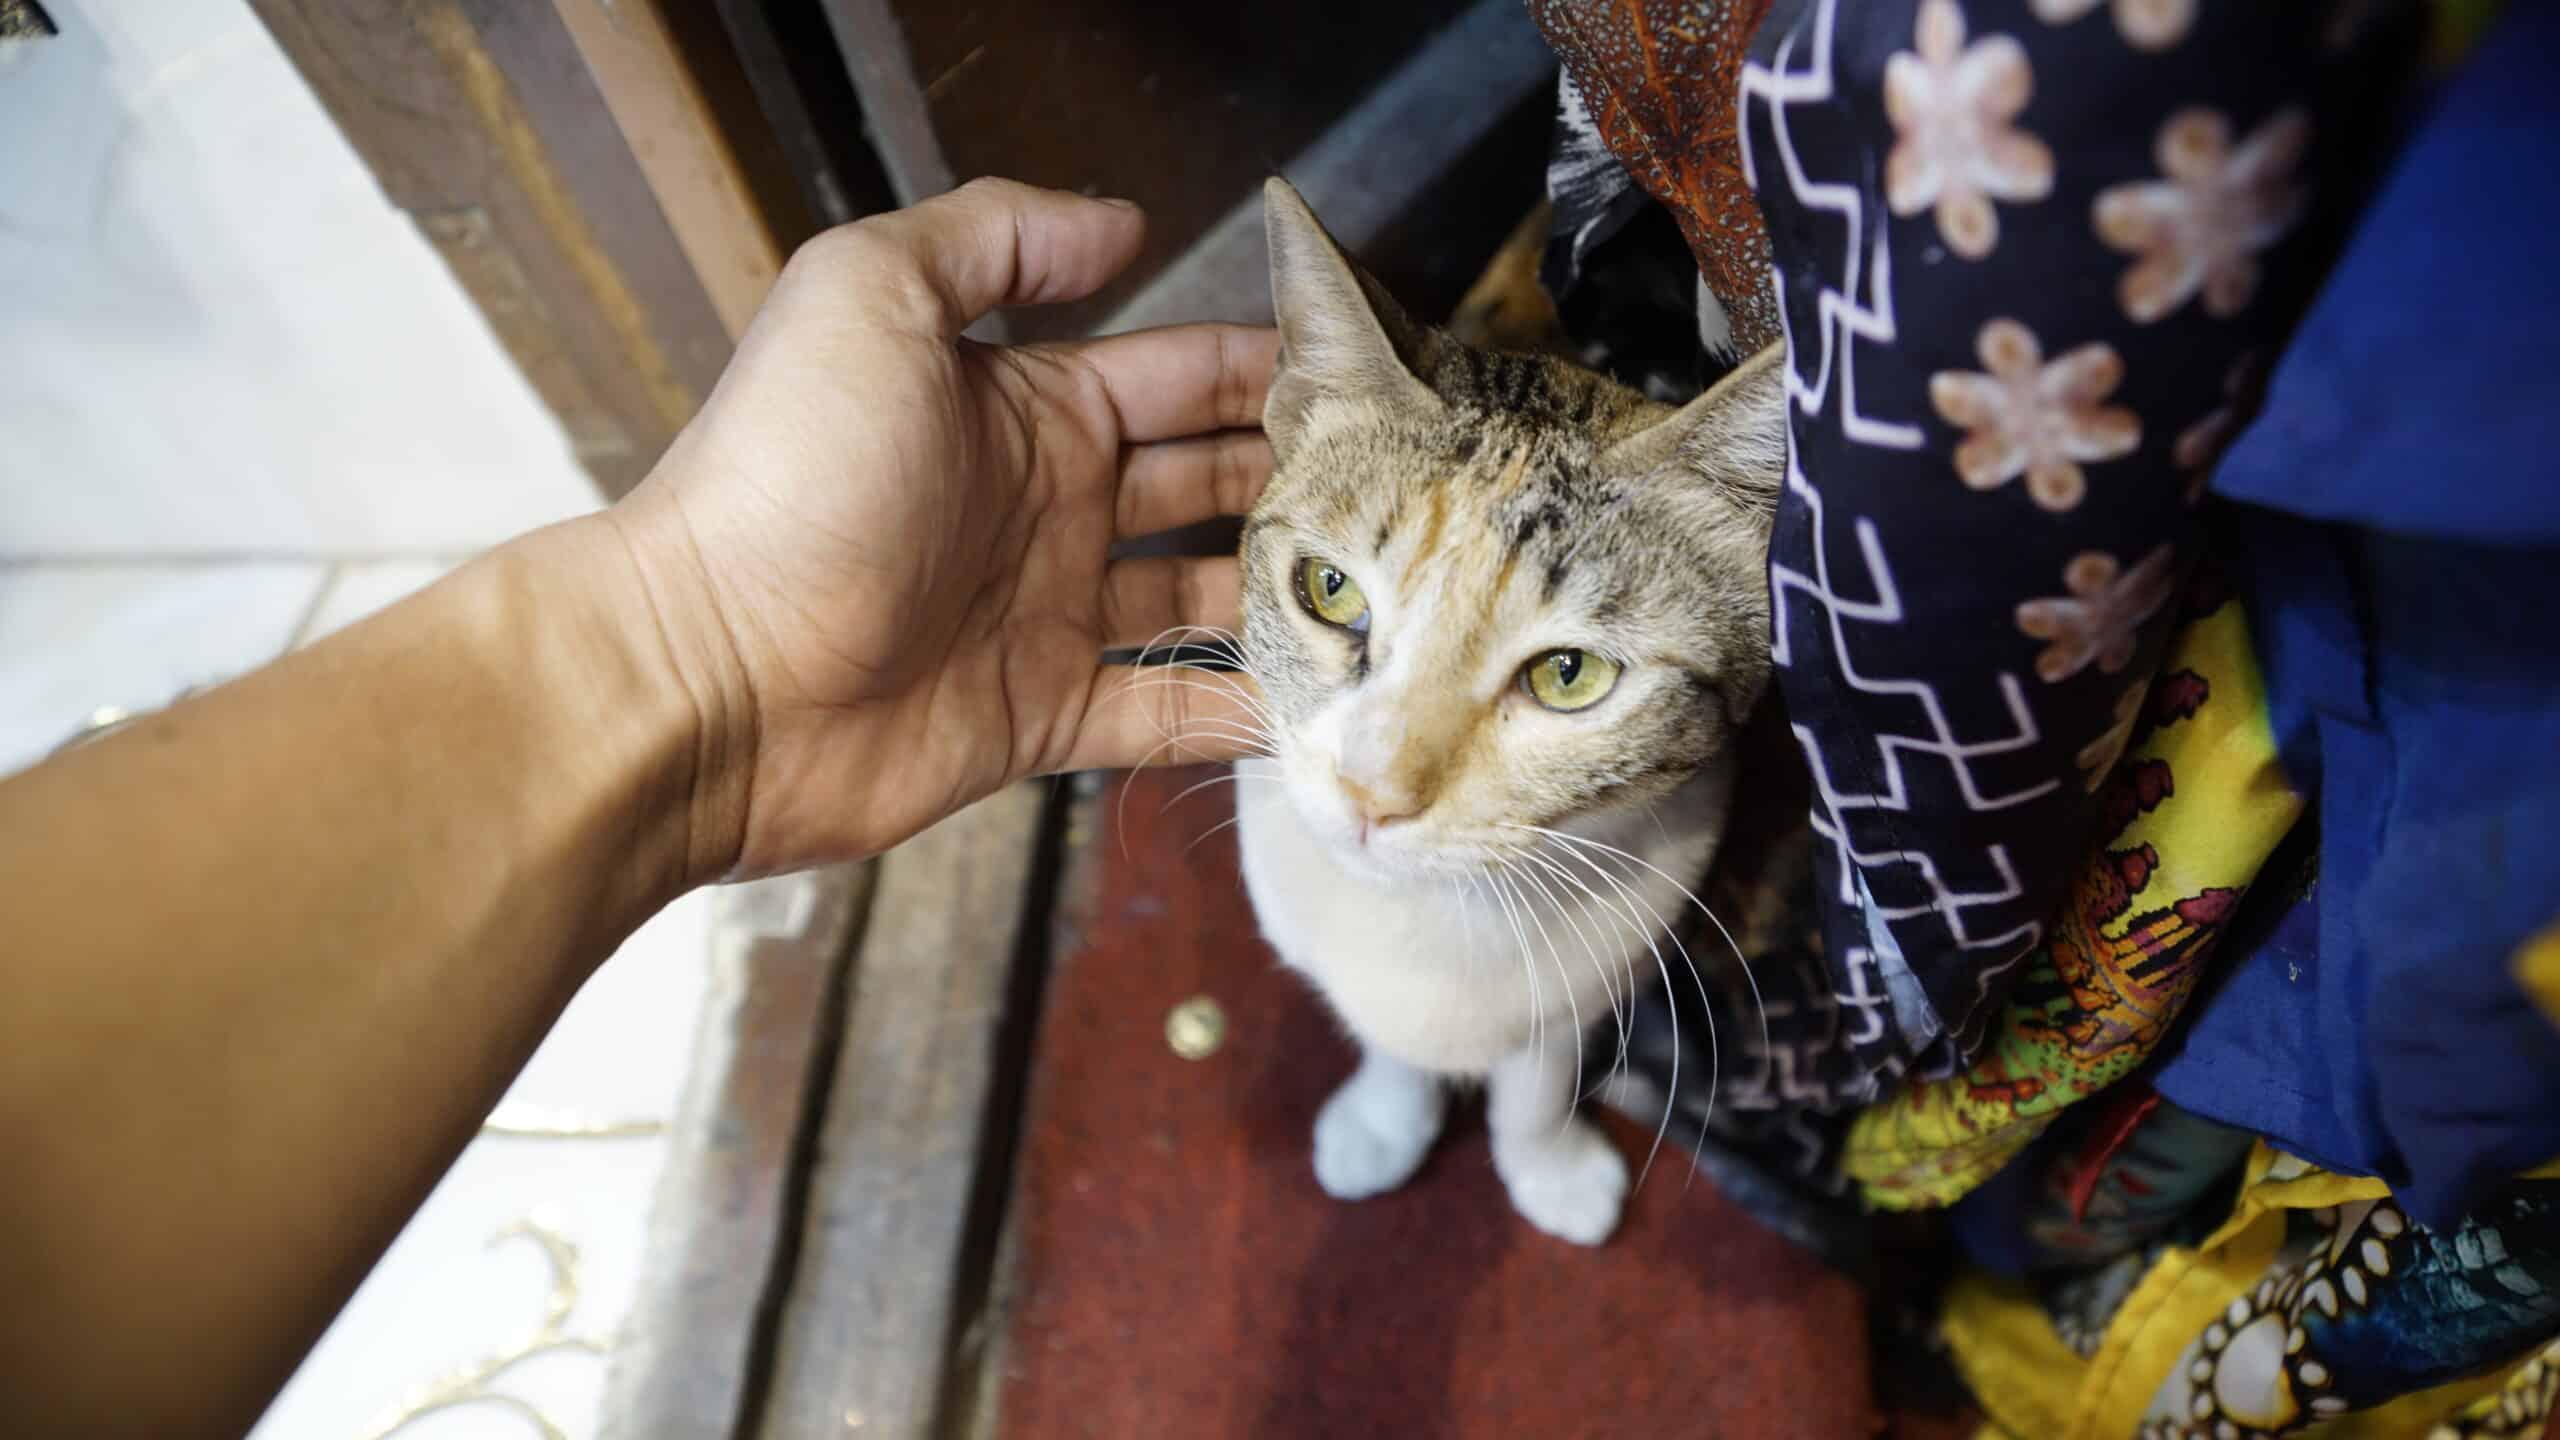 can cats sense bad people?